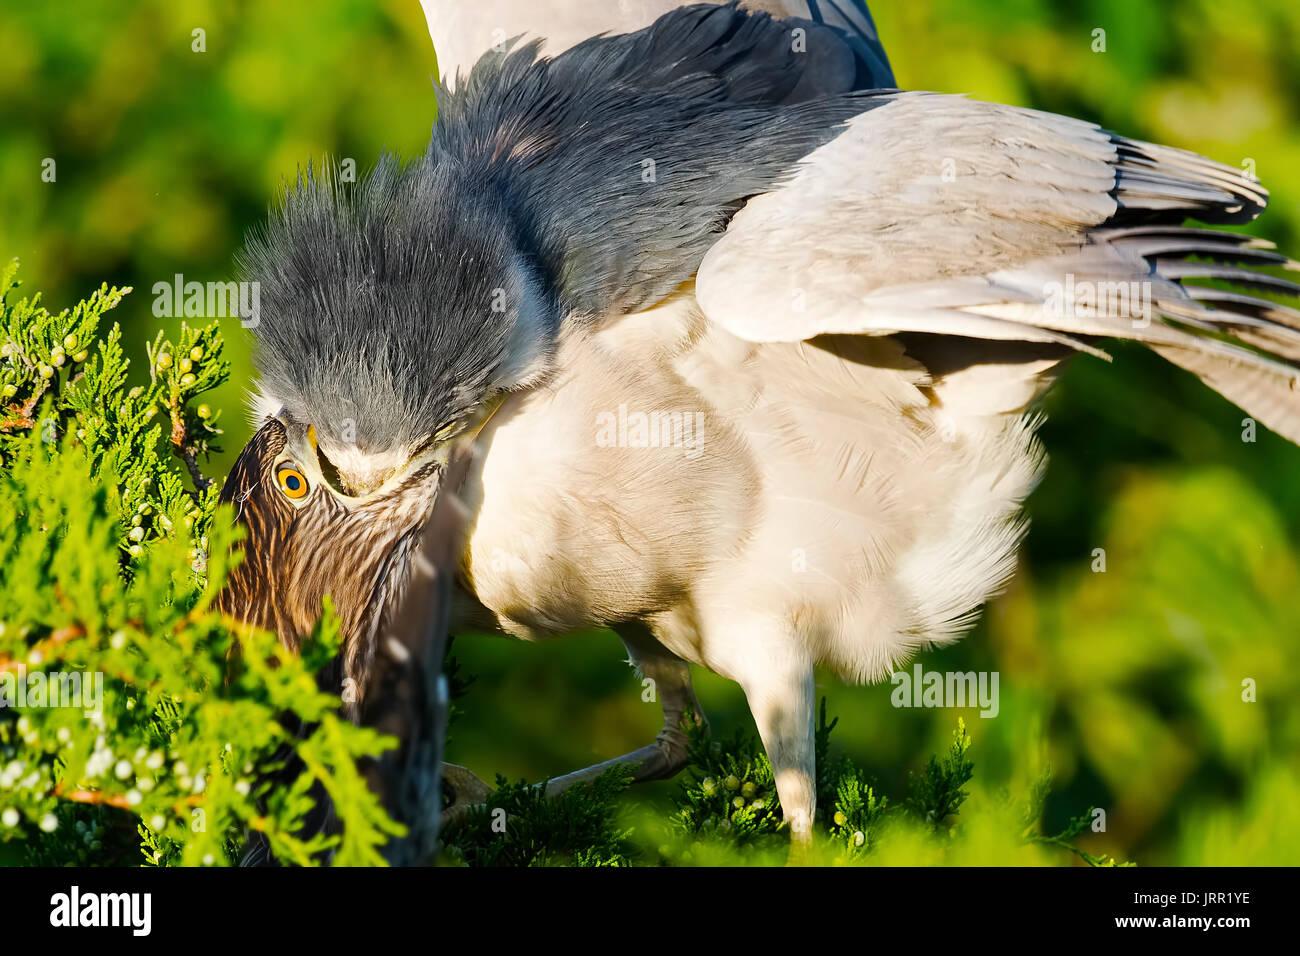 Black-crowned Night Heron Feeding Chick - Stock Image